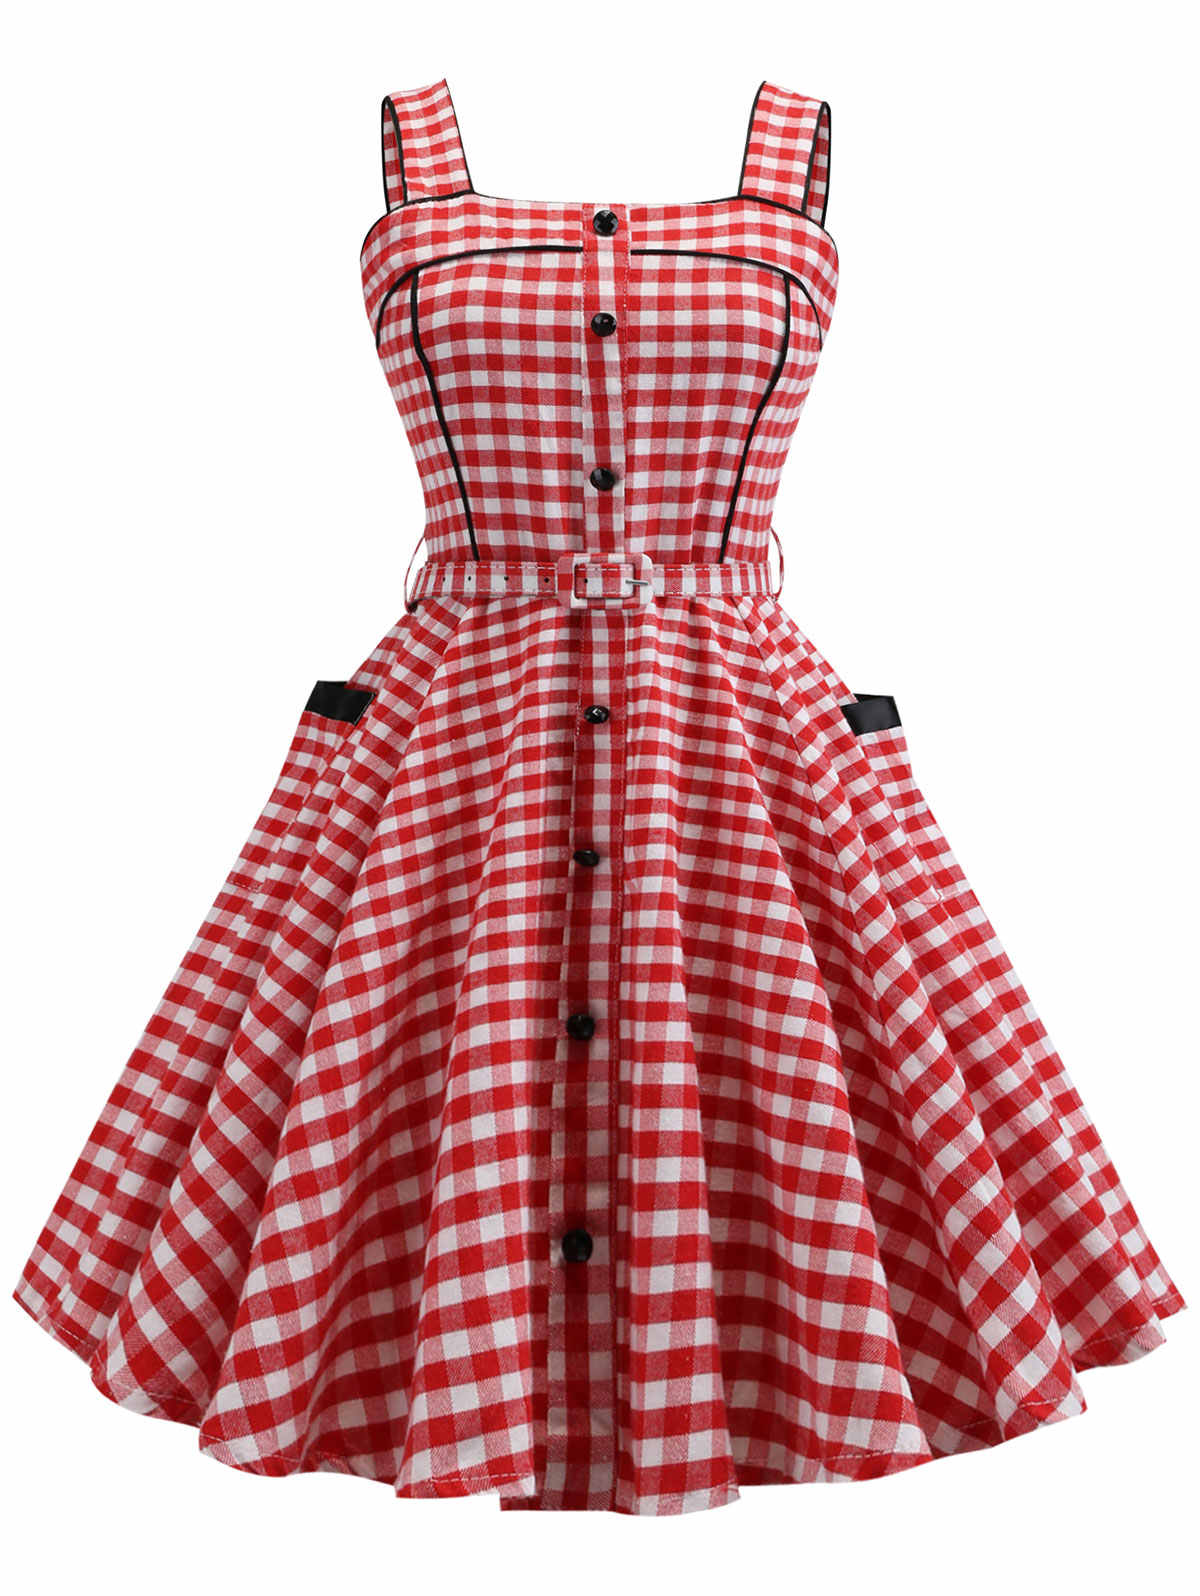 Wipalo Women Vintage Dress Button Spaghetti Strap Plaid Dress Sleeveless High  Waist Belted A-Line 4259a2b112cc